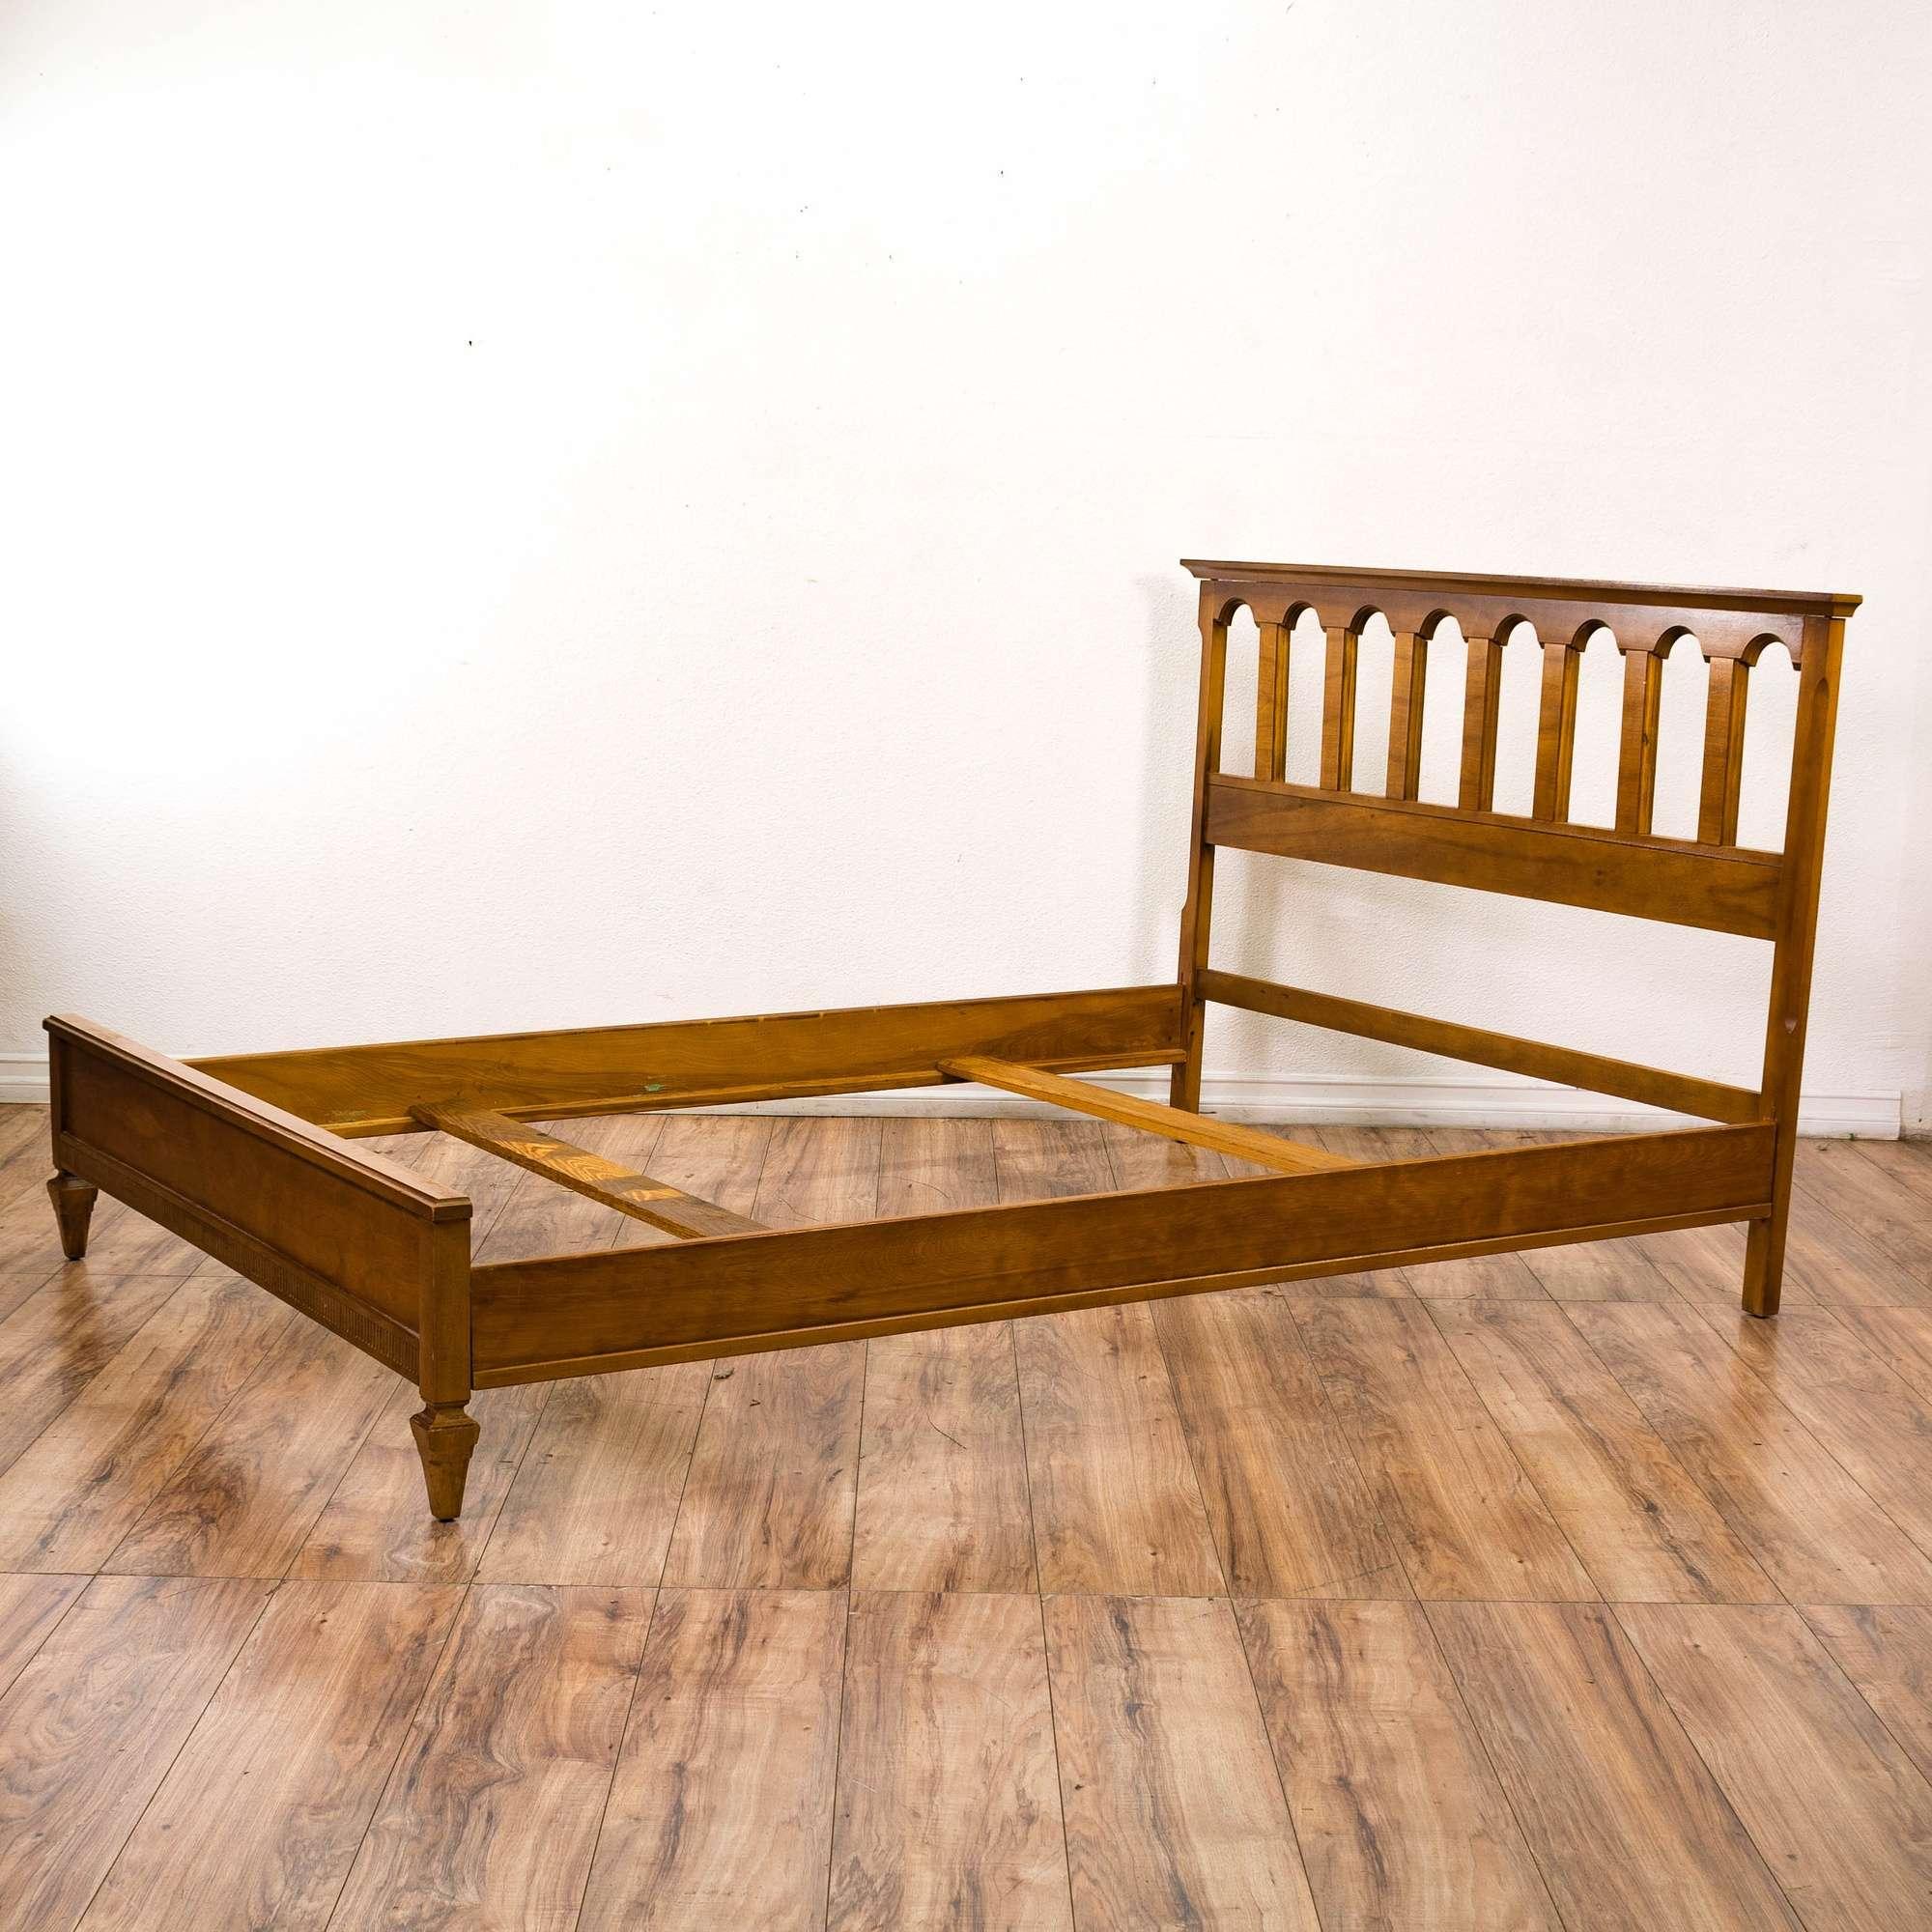 Traditional Full Size Arched Bed Frame | Loveseat Vintage Furniture